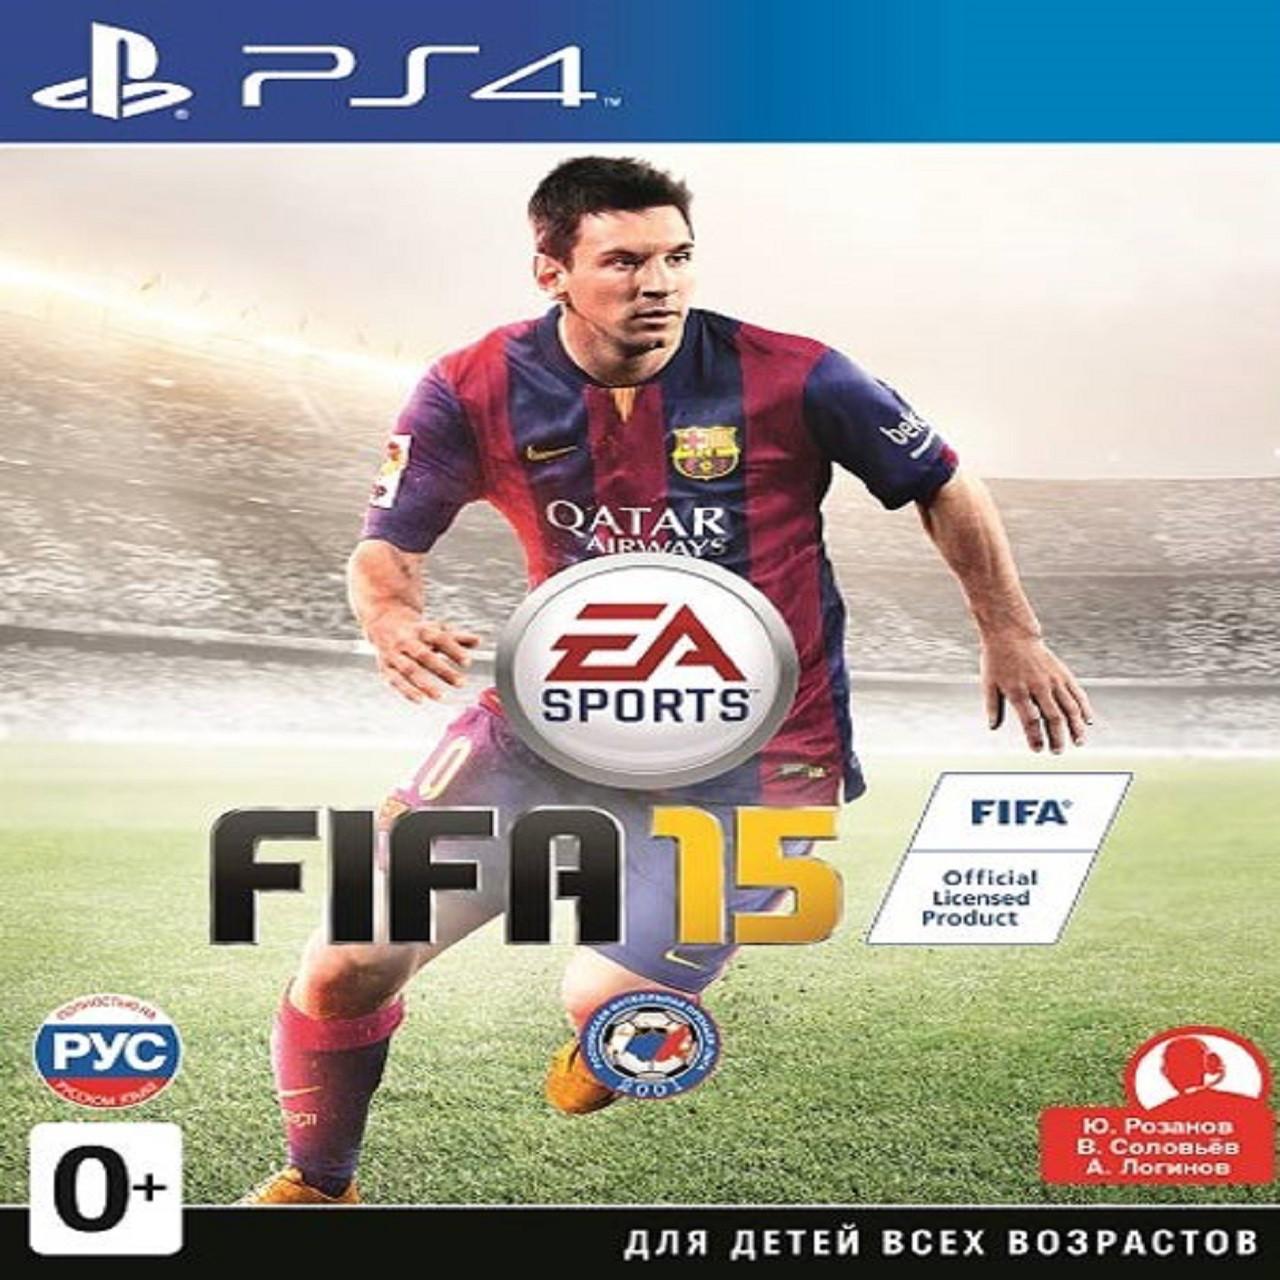 Fifa 15 RUS PS4 (Б/В) {БЕЗ КЕЙСА}